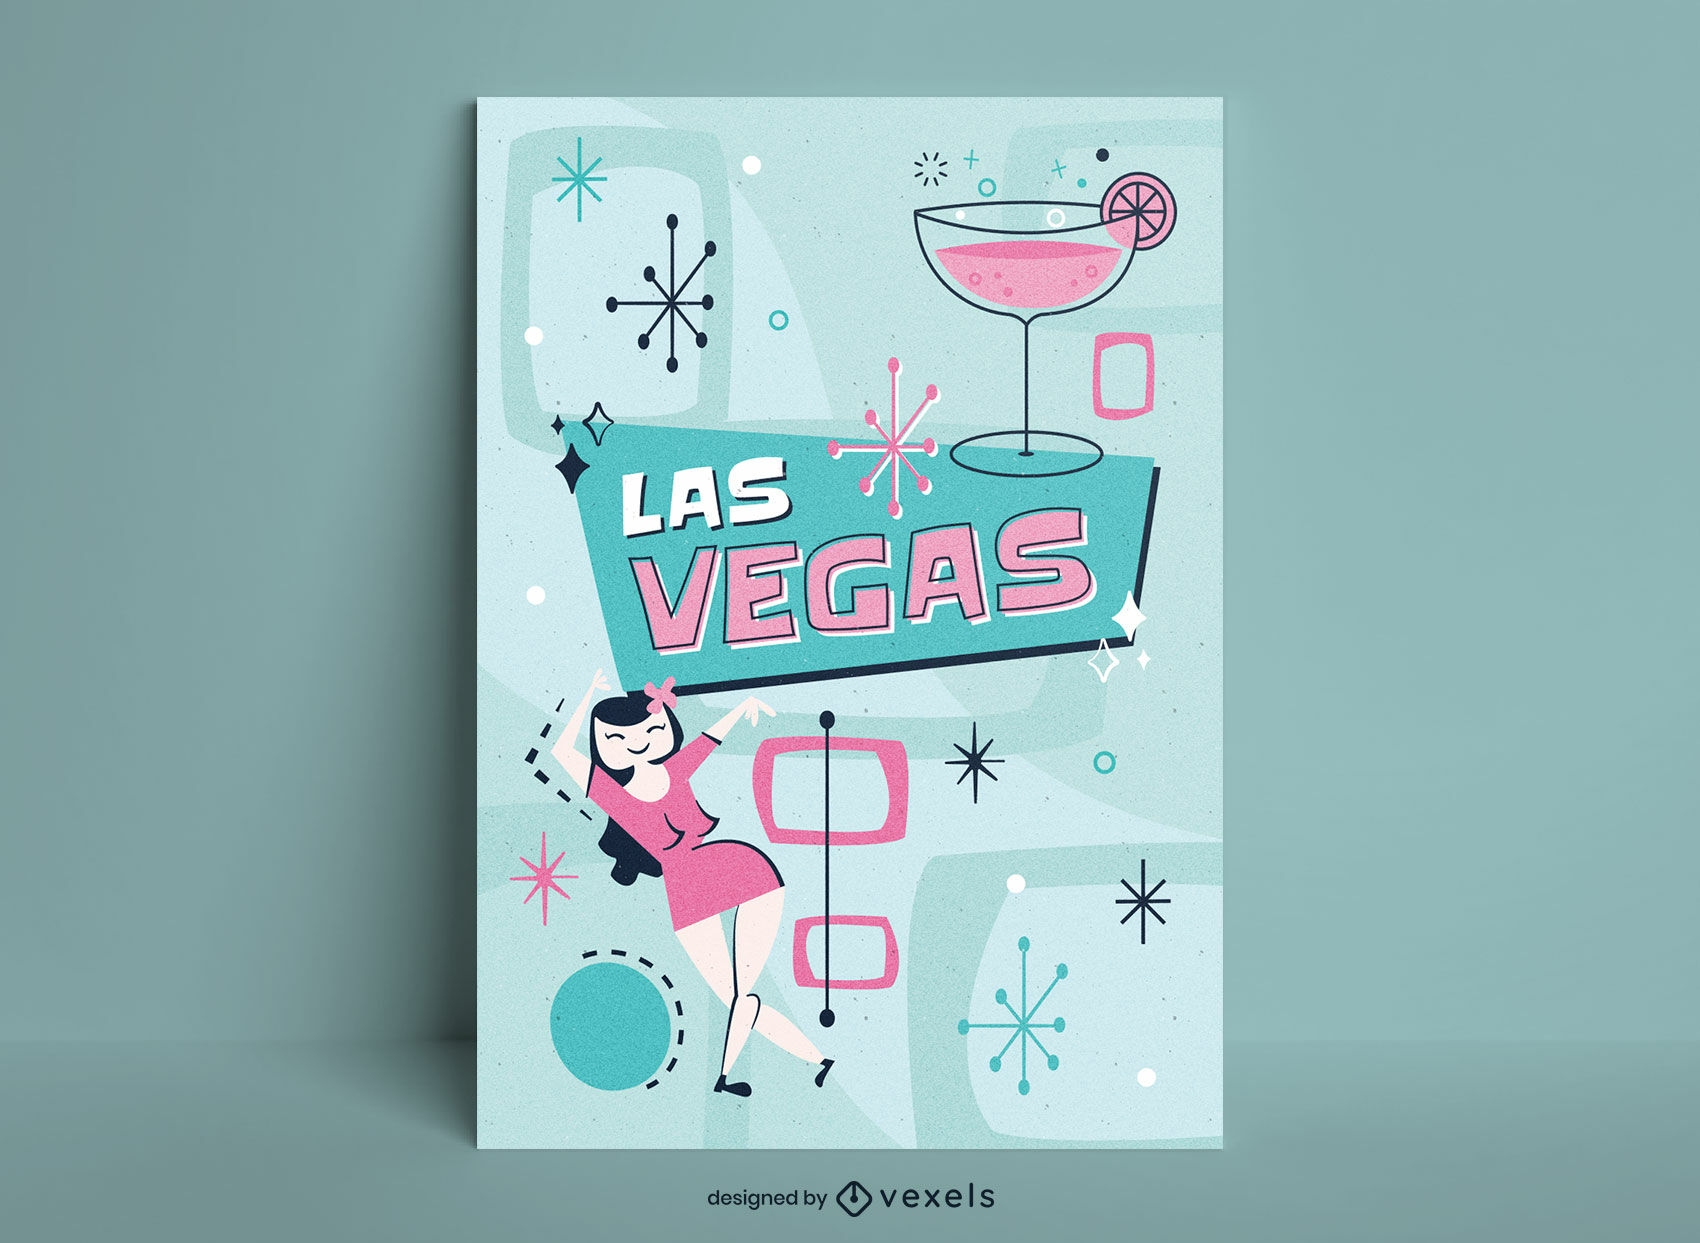 Las vegas party retro poster design